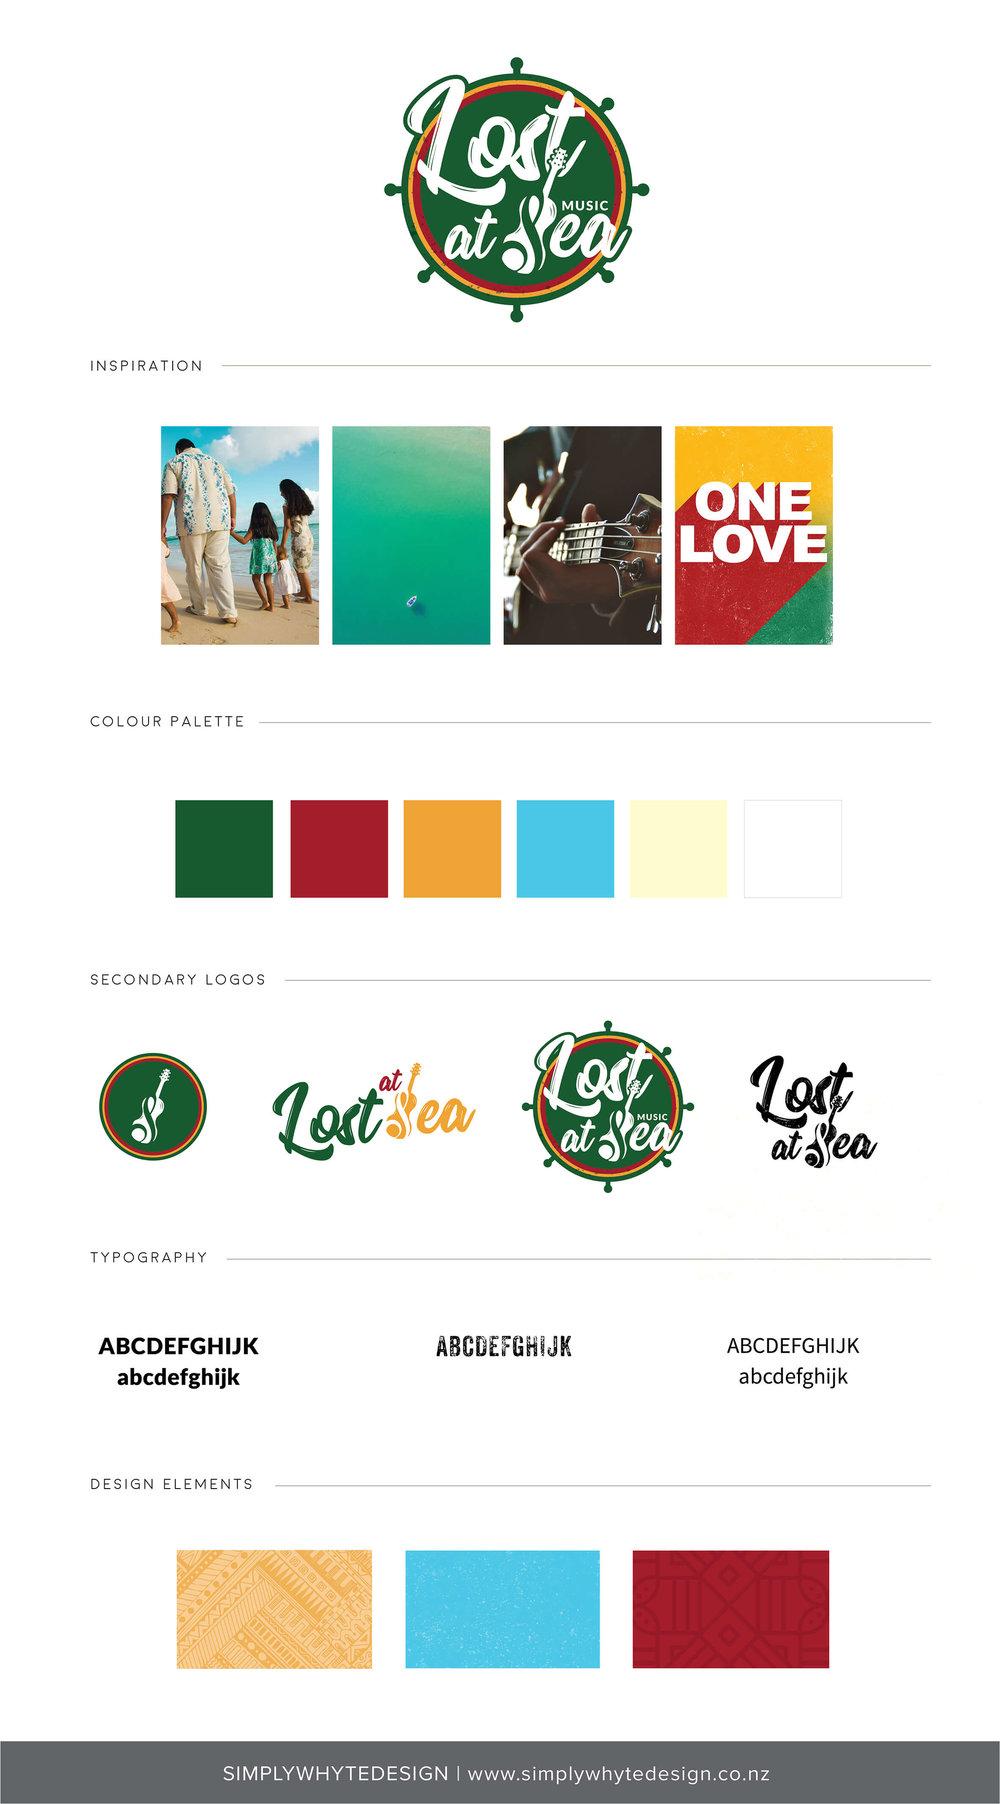 171110_LAS_Brand_Board.jpg